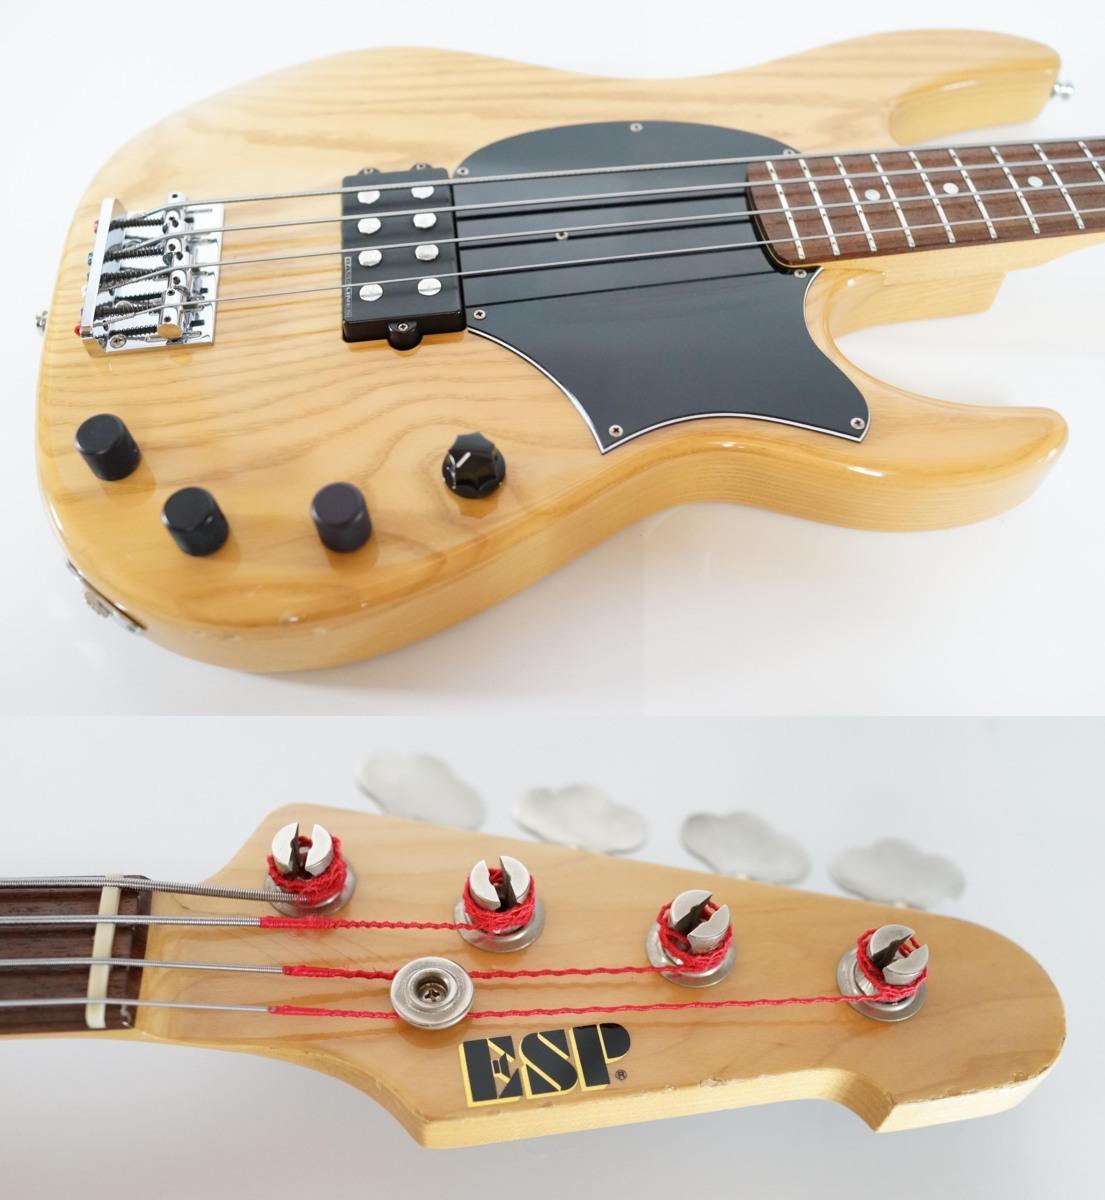 「ESP AP-200 Natural Ashボディ Seymour Duncanピックアップ搭載モデル (ESP エレキベース)」の画像